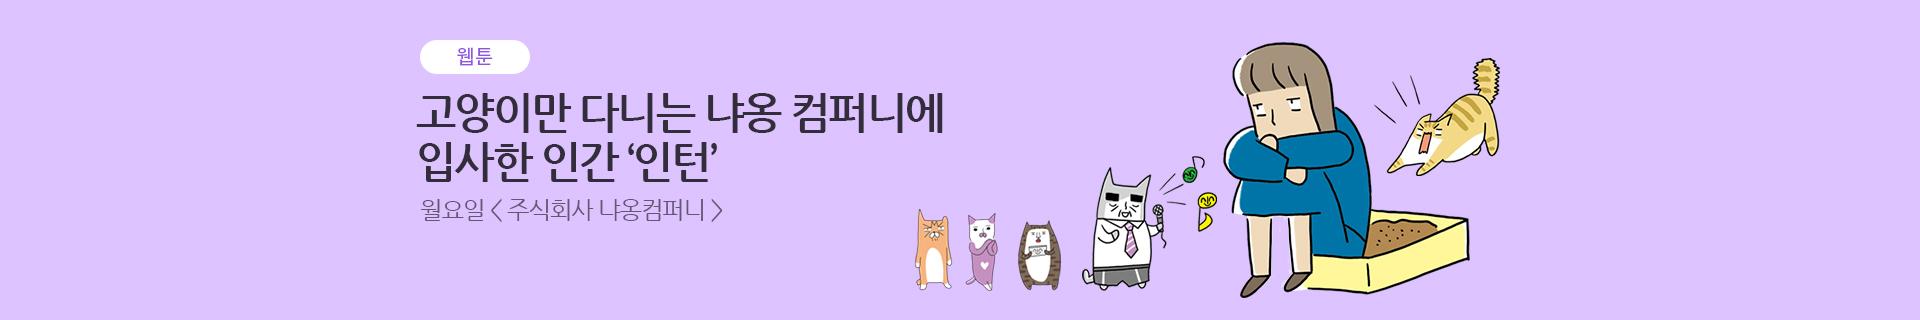 PC_sub_bn_웹툰_주식회사냐옹컴퍼니_1920x320_(수정).jpg